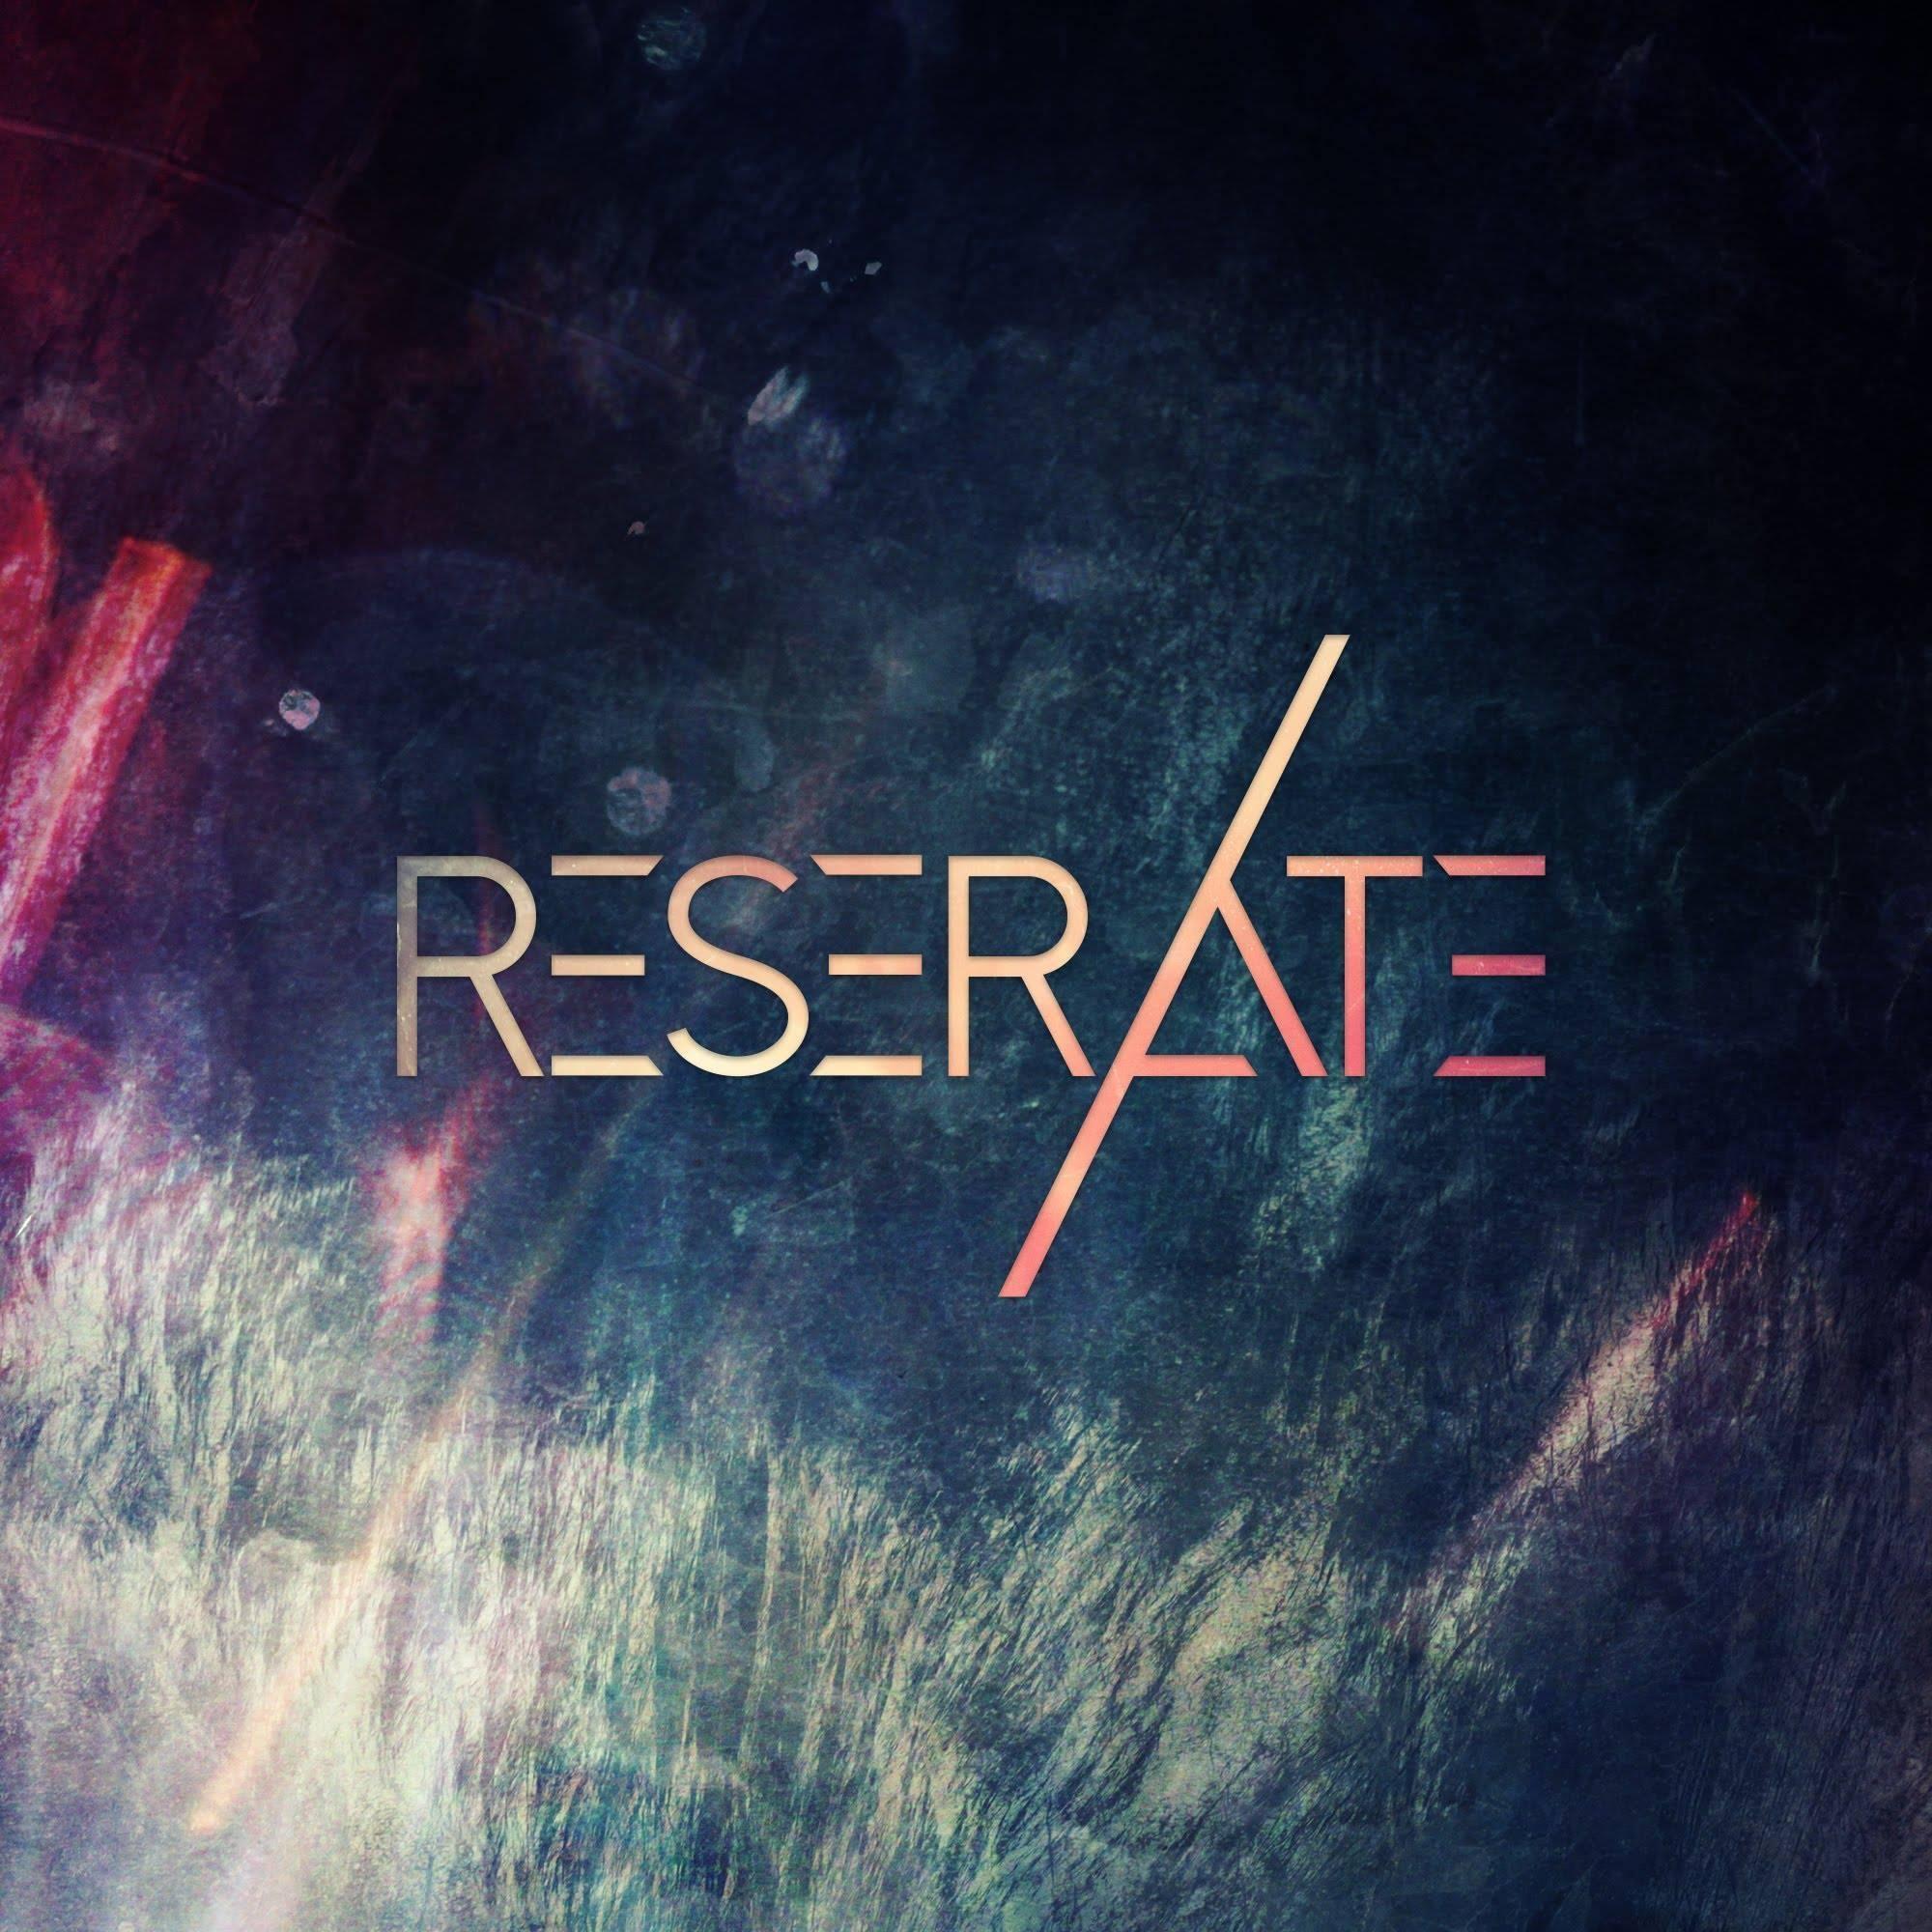 Reserate